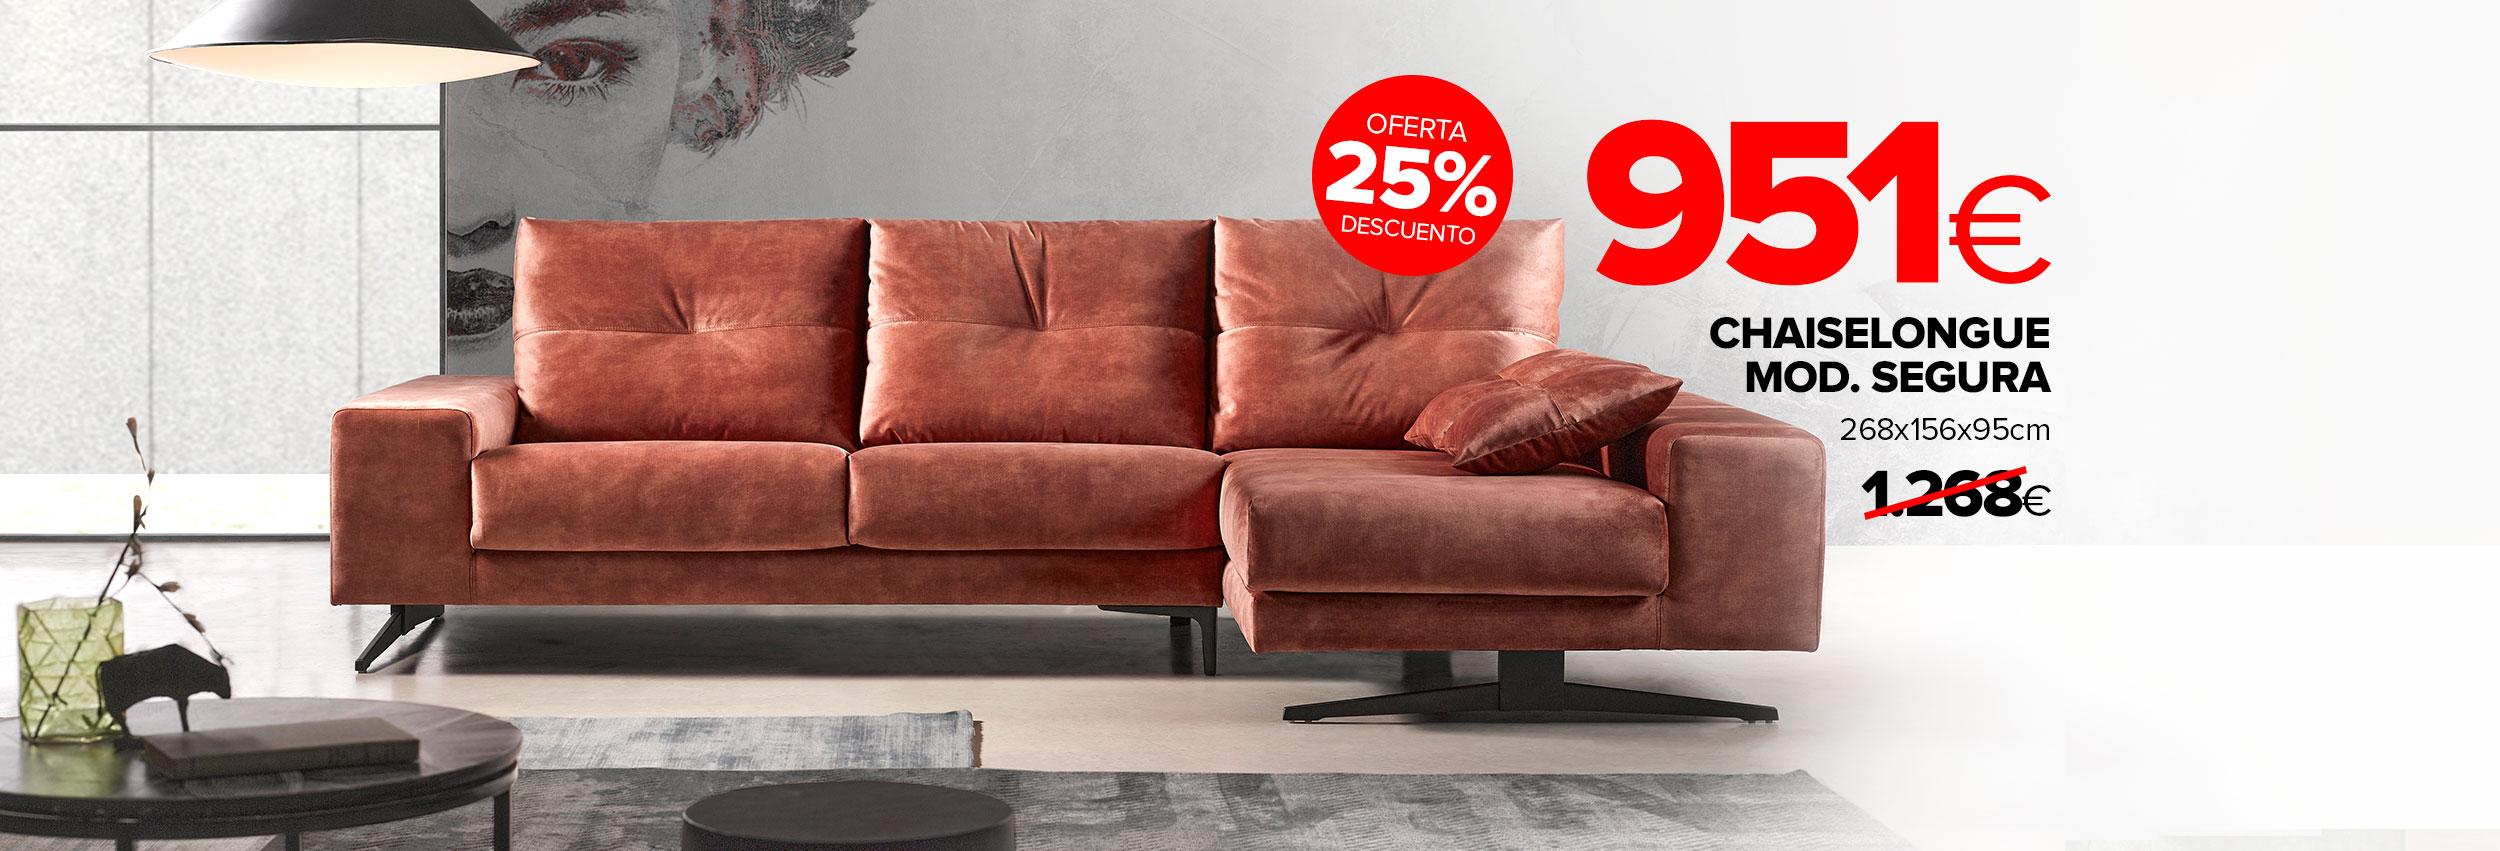 sofa chaise longue online barato